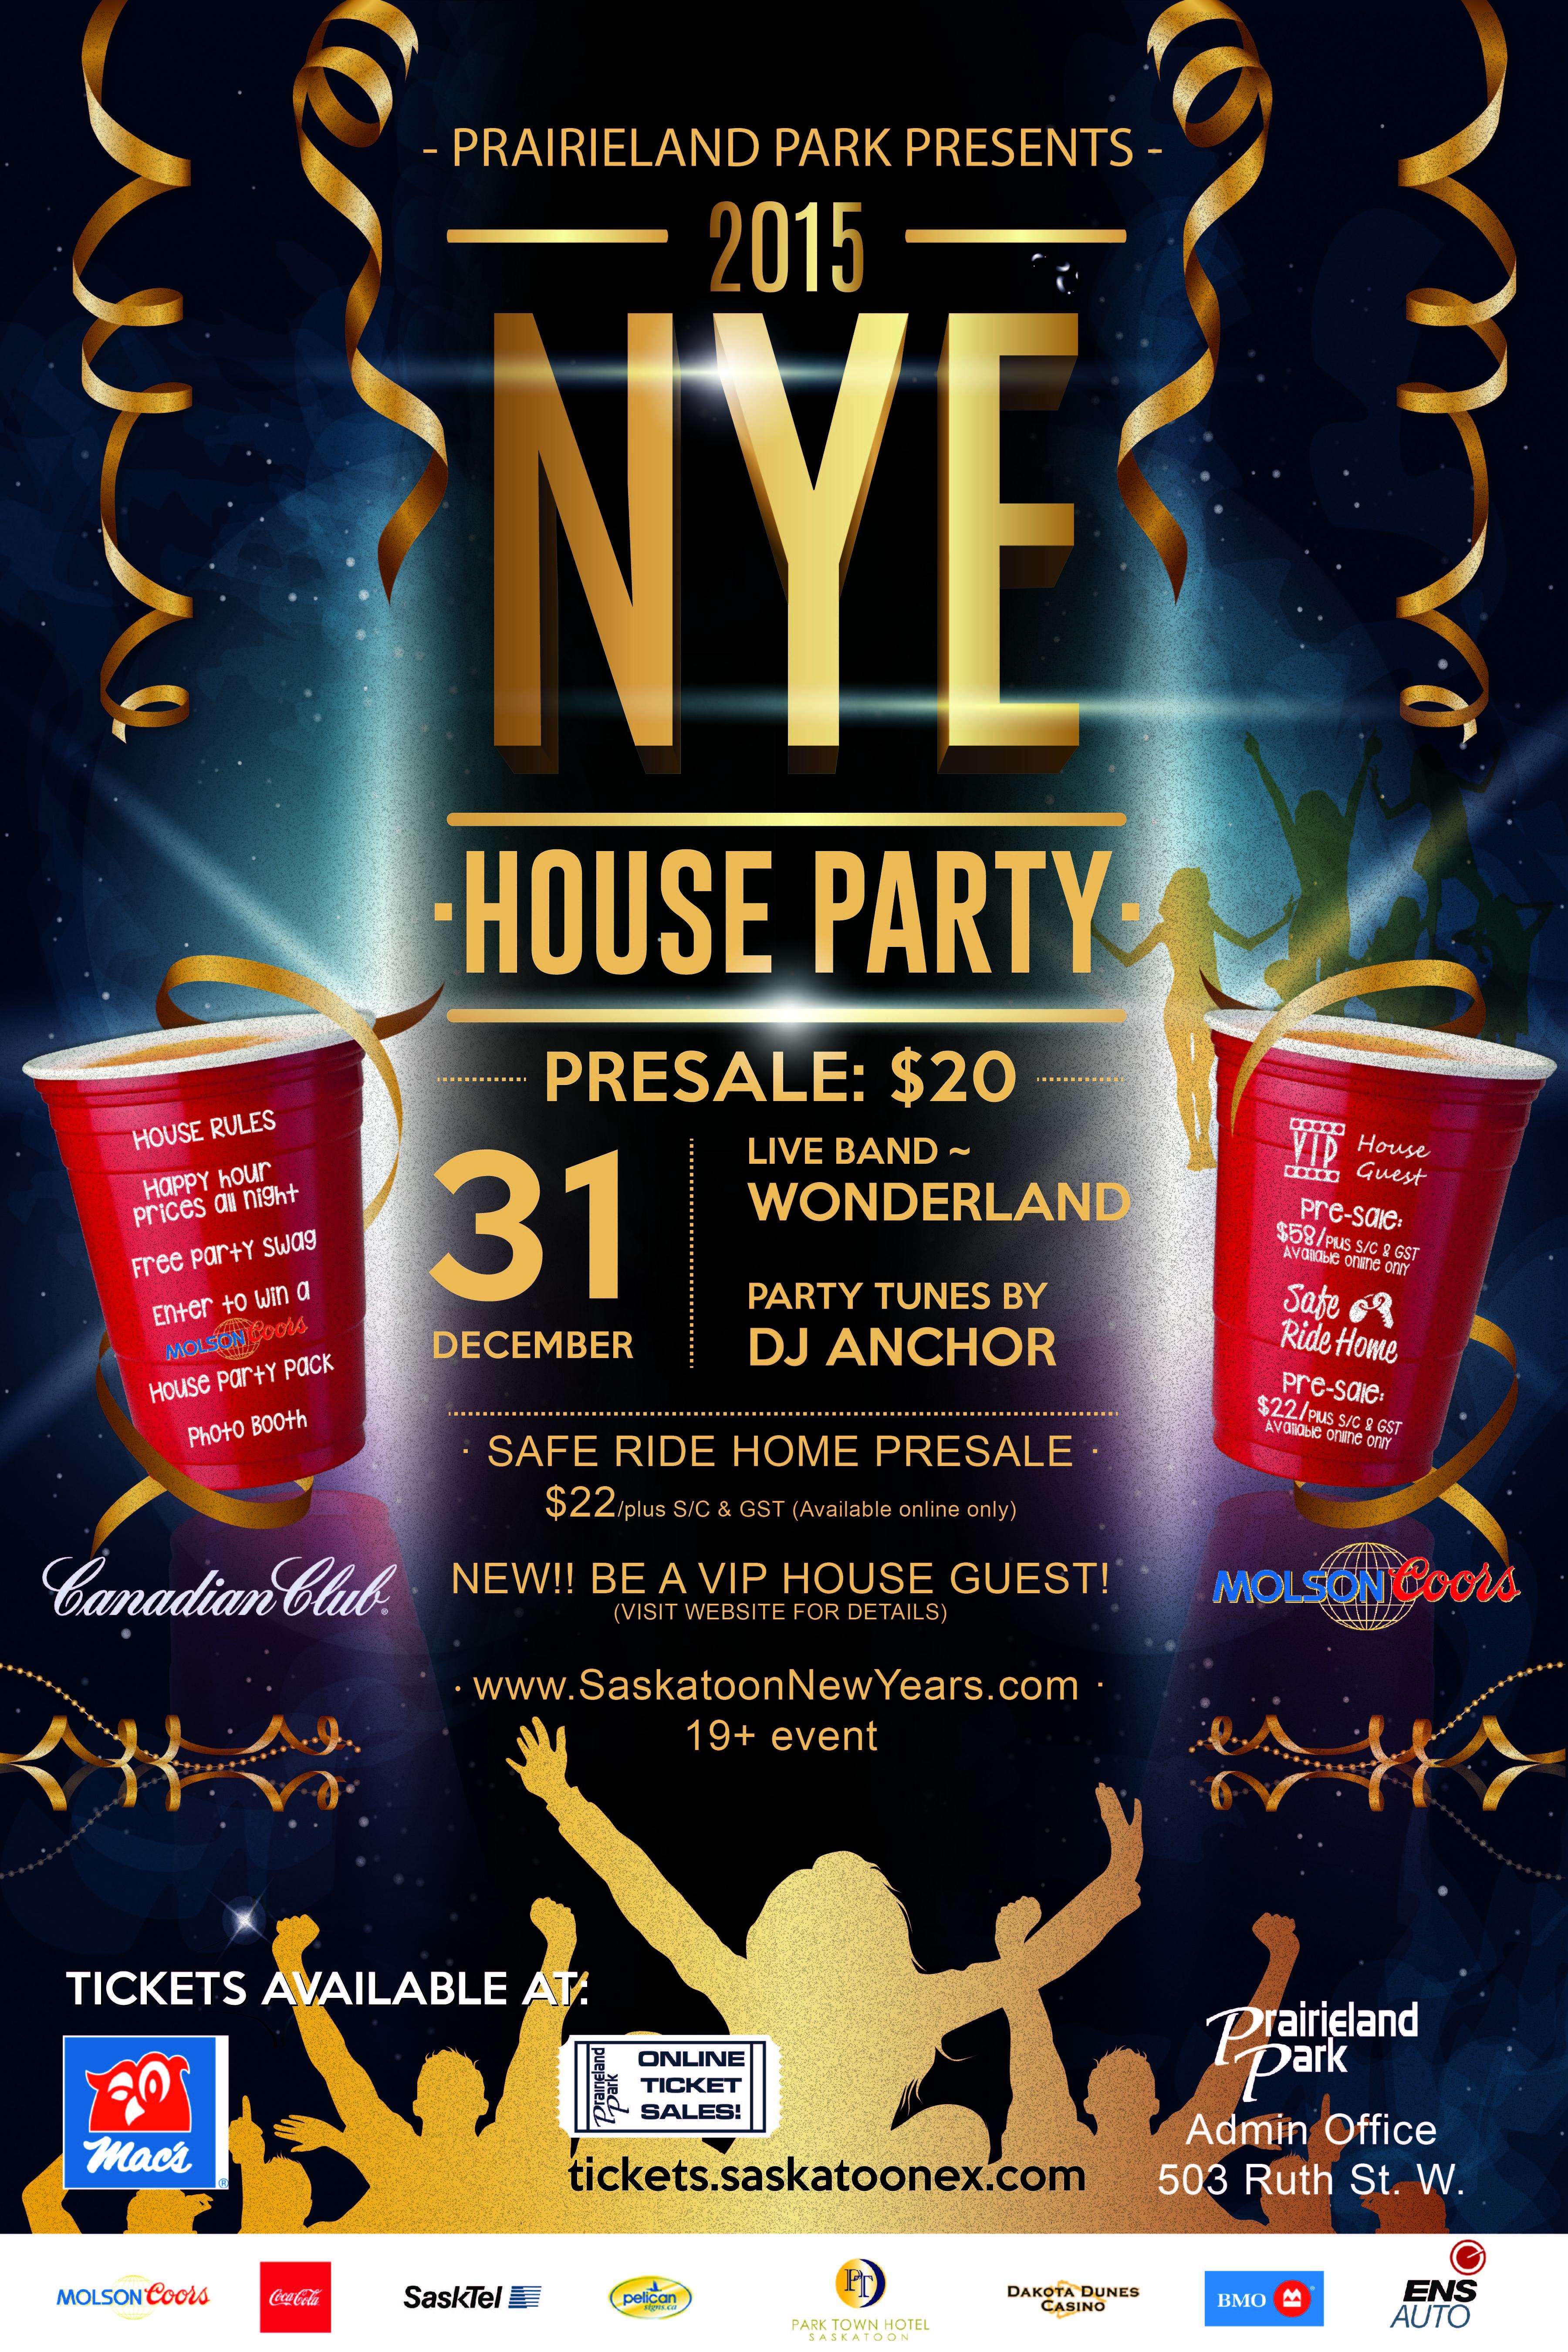 Saskatoon's Biggest New Years Eve Party! Prairieland Park w/ Dj Anchor - Image 1